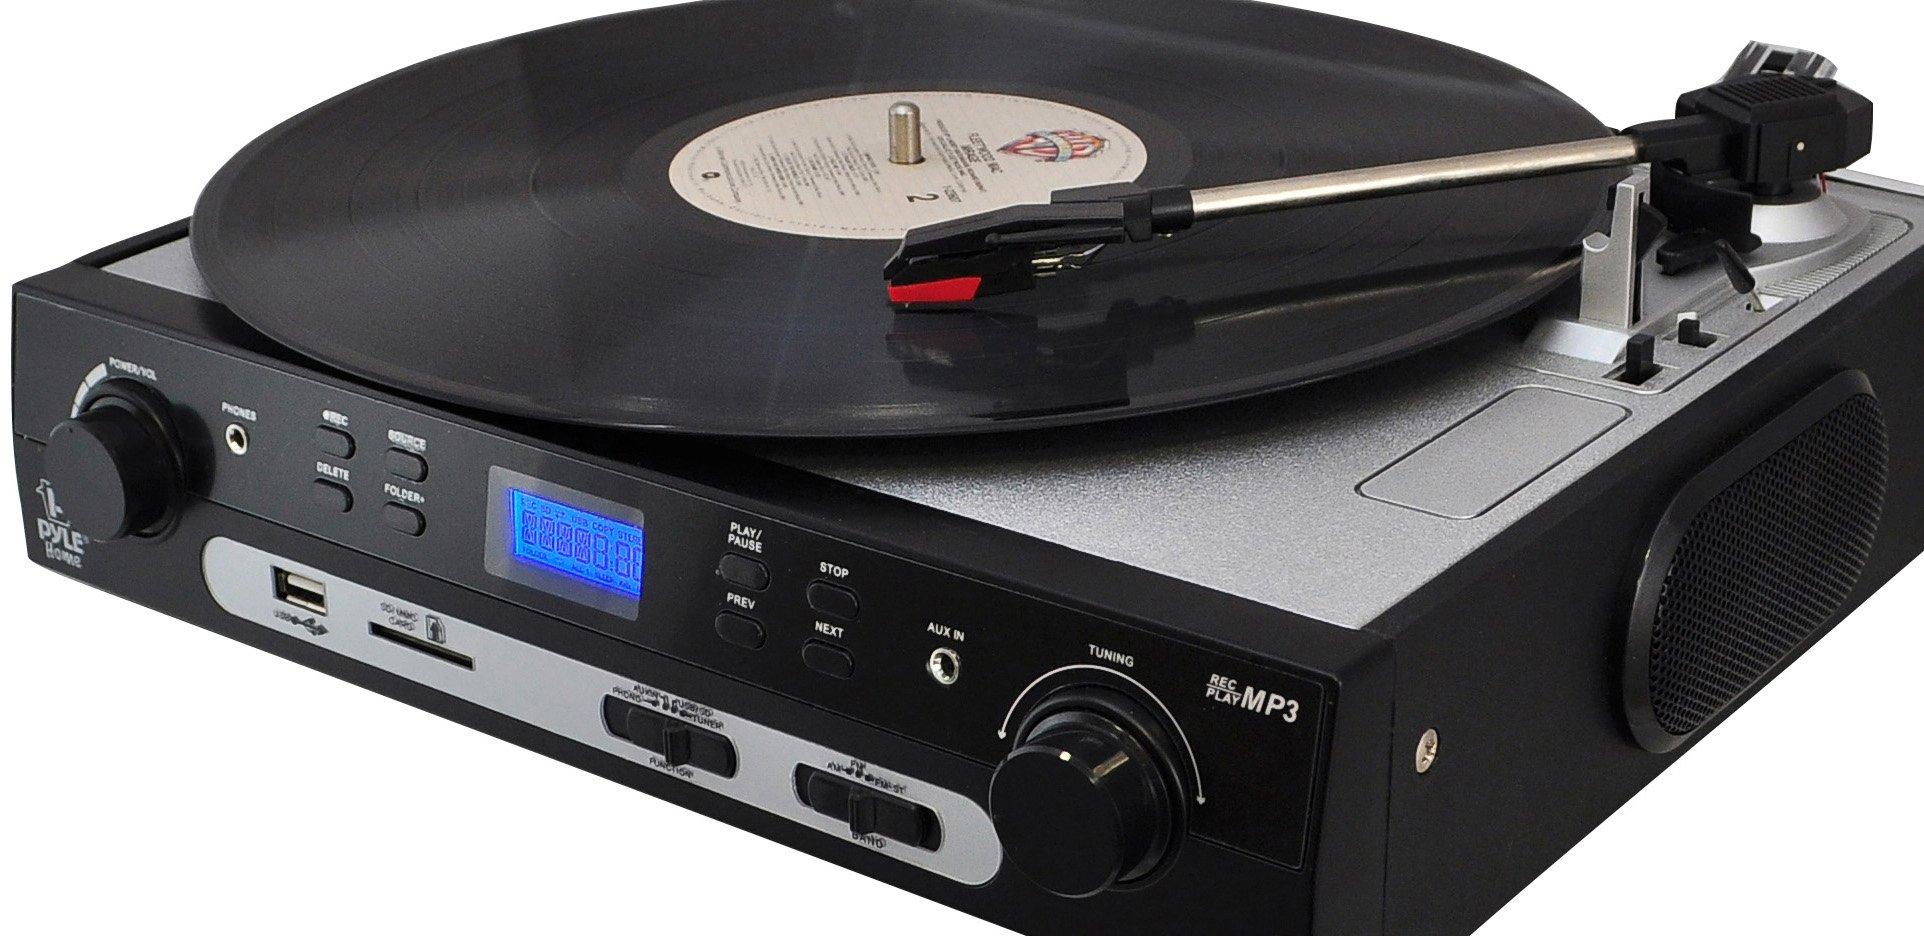 Pyle Upgraded Vintage Record Player - Classic Vinyl Player, Retro Turntable, MP3 Vinyl, Music Editing Software Included, Ceramic Cartridge, FM Tuner, MP3 Converter,  3 Speed - 33, 45, 78 - PLTTB9U